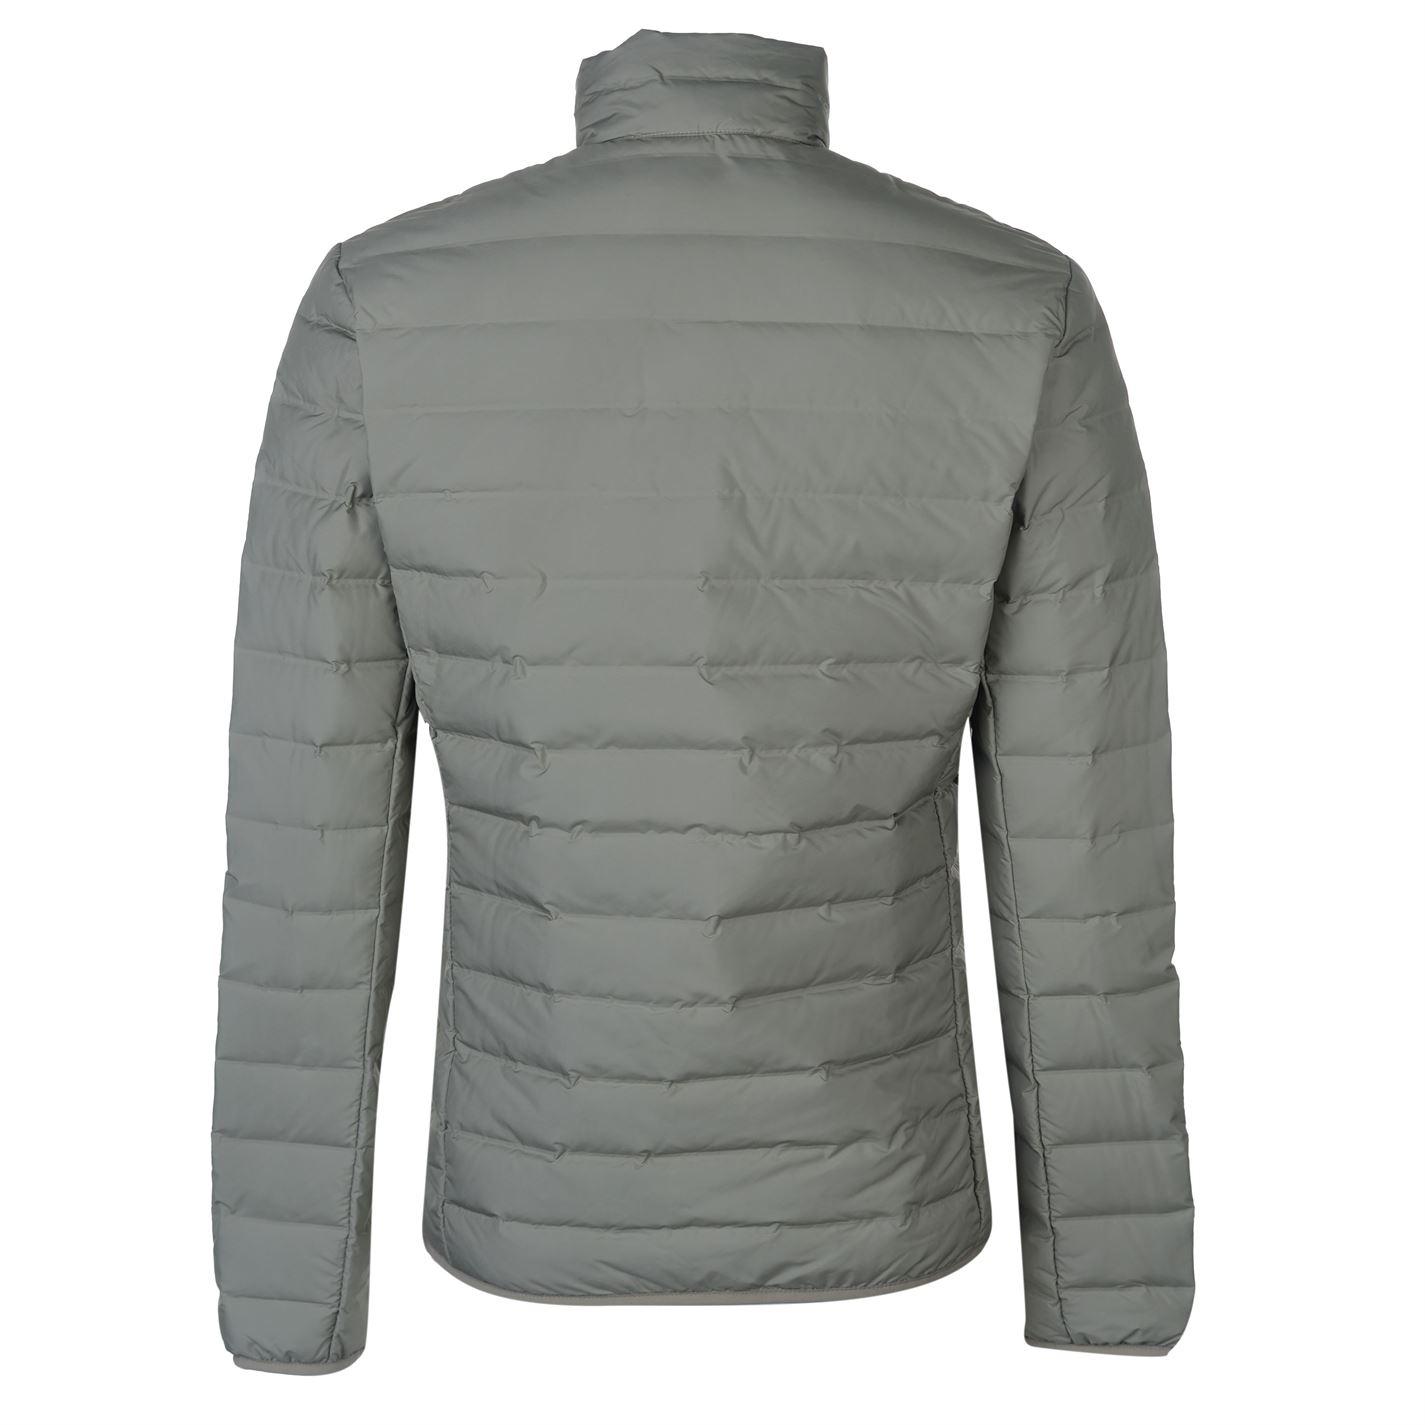 e975d39e adidas Mens Varilite Jacket Puffer Coat Top Long Sleeve Chin Guard ...